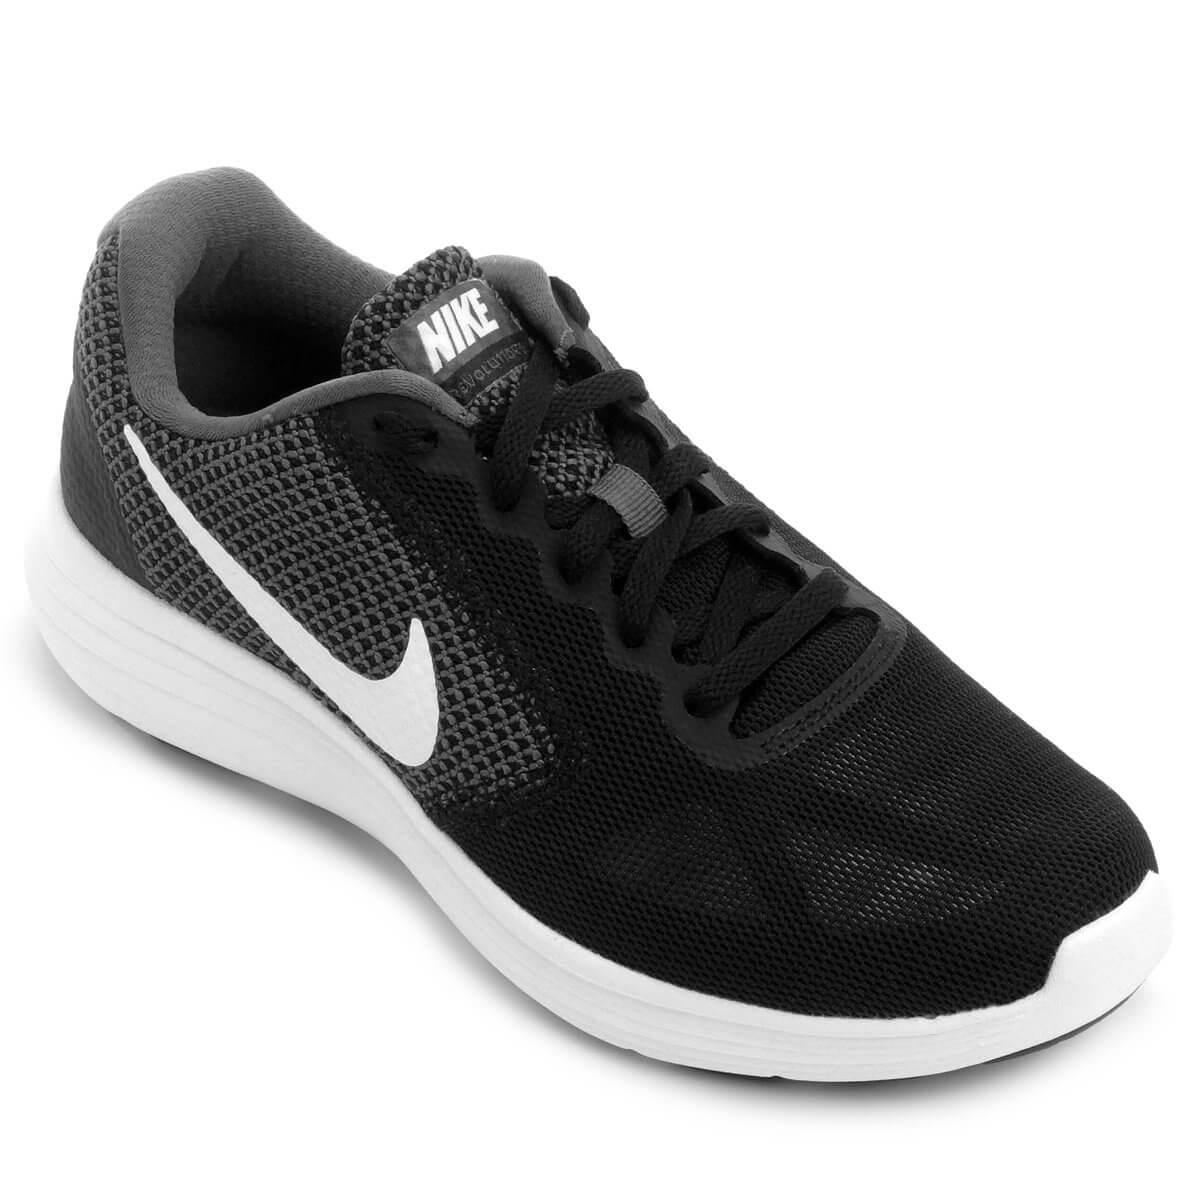 8eeed8131c9 Tênis Nike Revolution 3 Feminino - Decker Online!